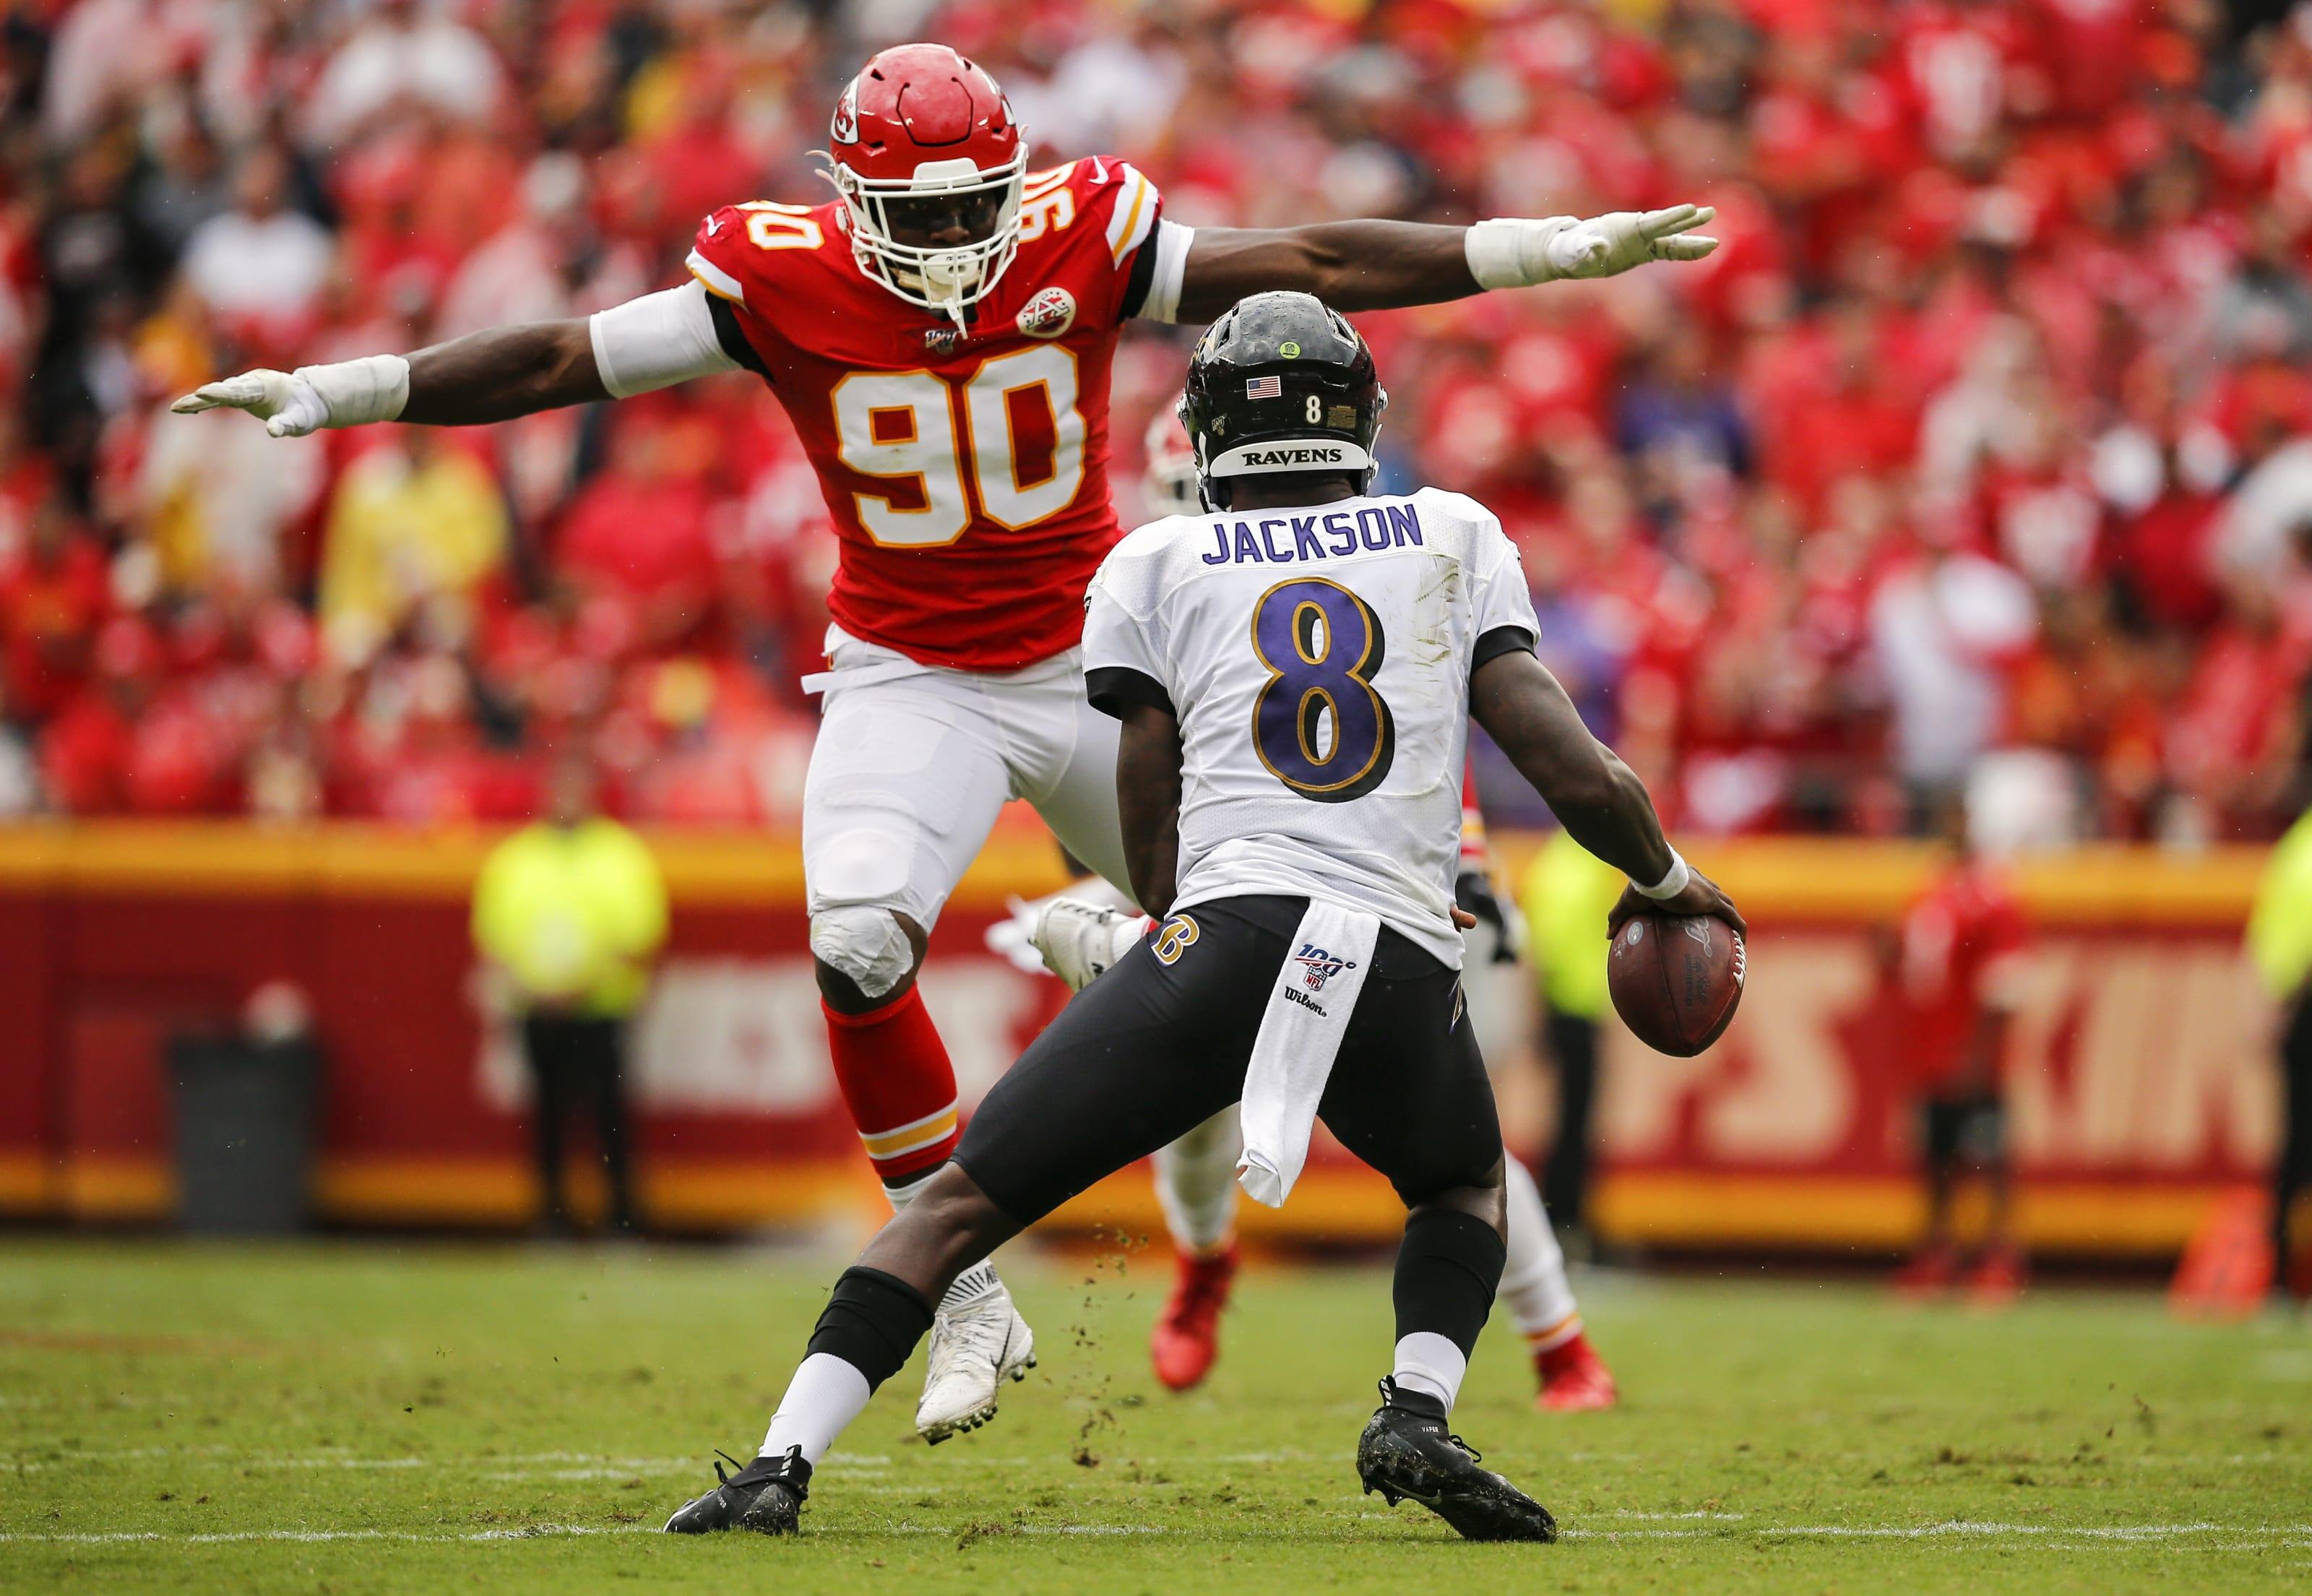 Kansas City Chiefs Defensive End Emmanuel Ogbah jumping at Baltimore Ravens Quarterback Lamar Jackson.